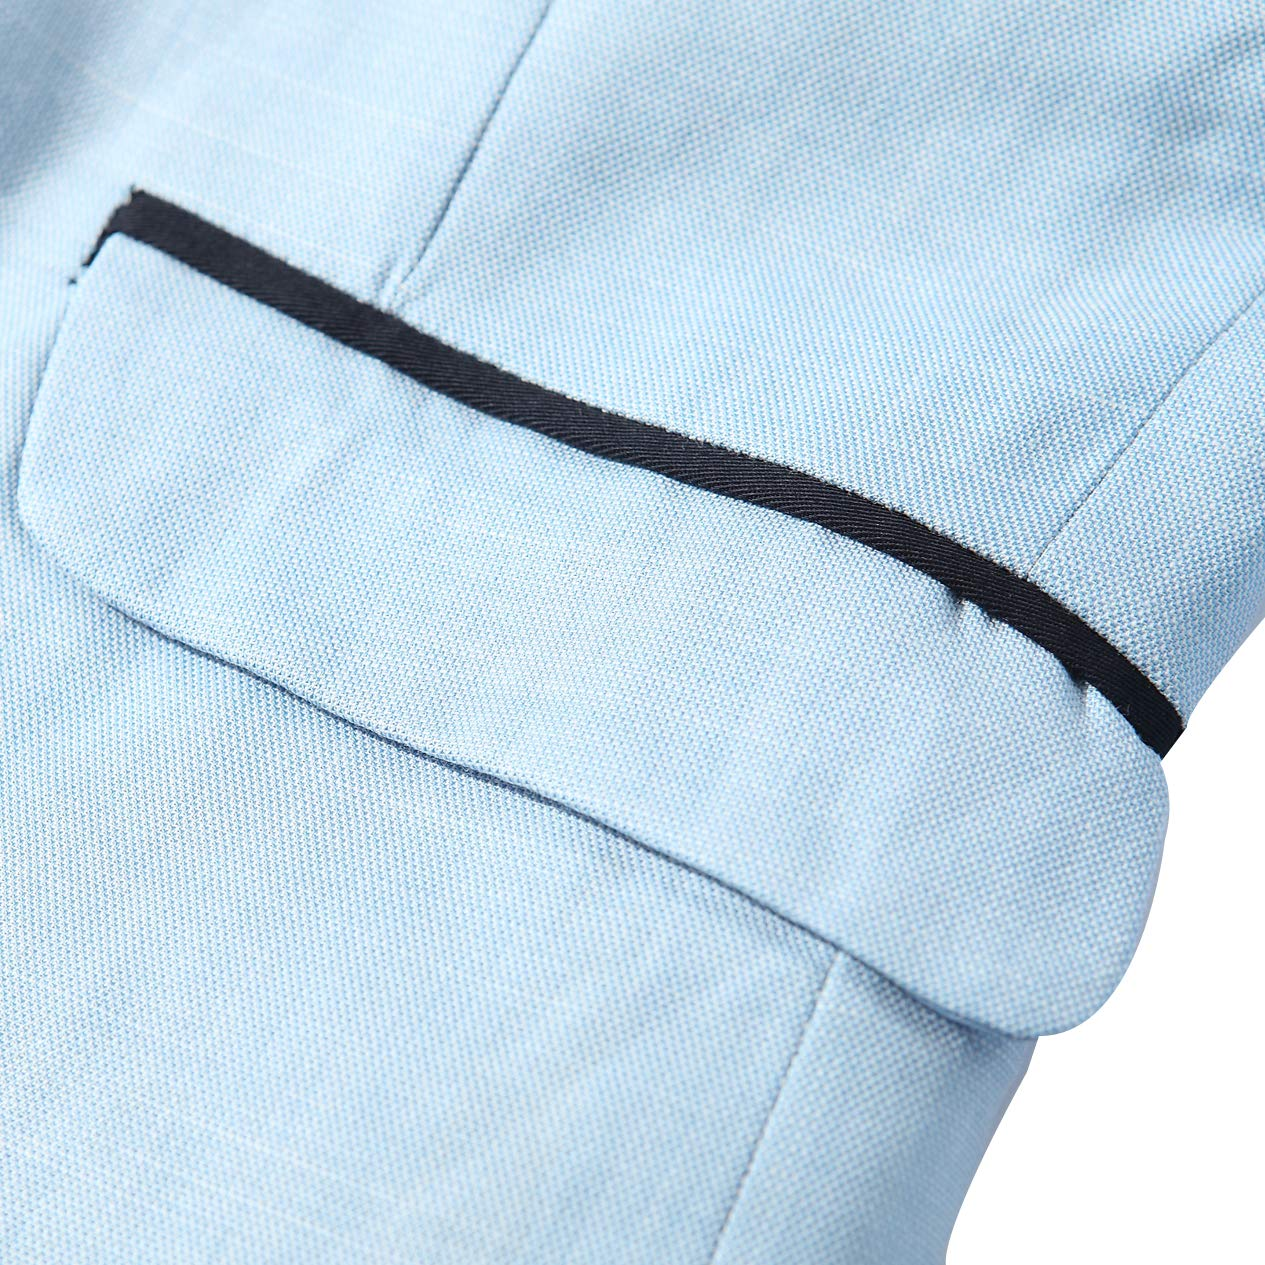 JiaYou Child Kid Boy Casual Slim Fit Outwear Coat Blazer Jacket